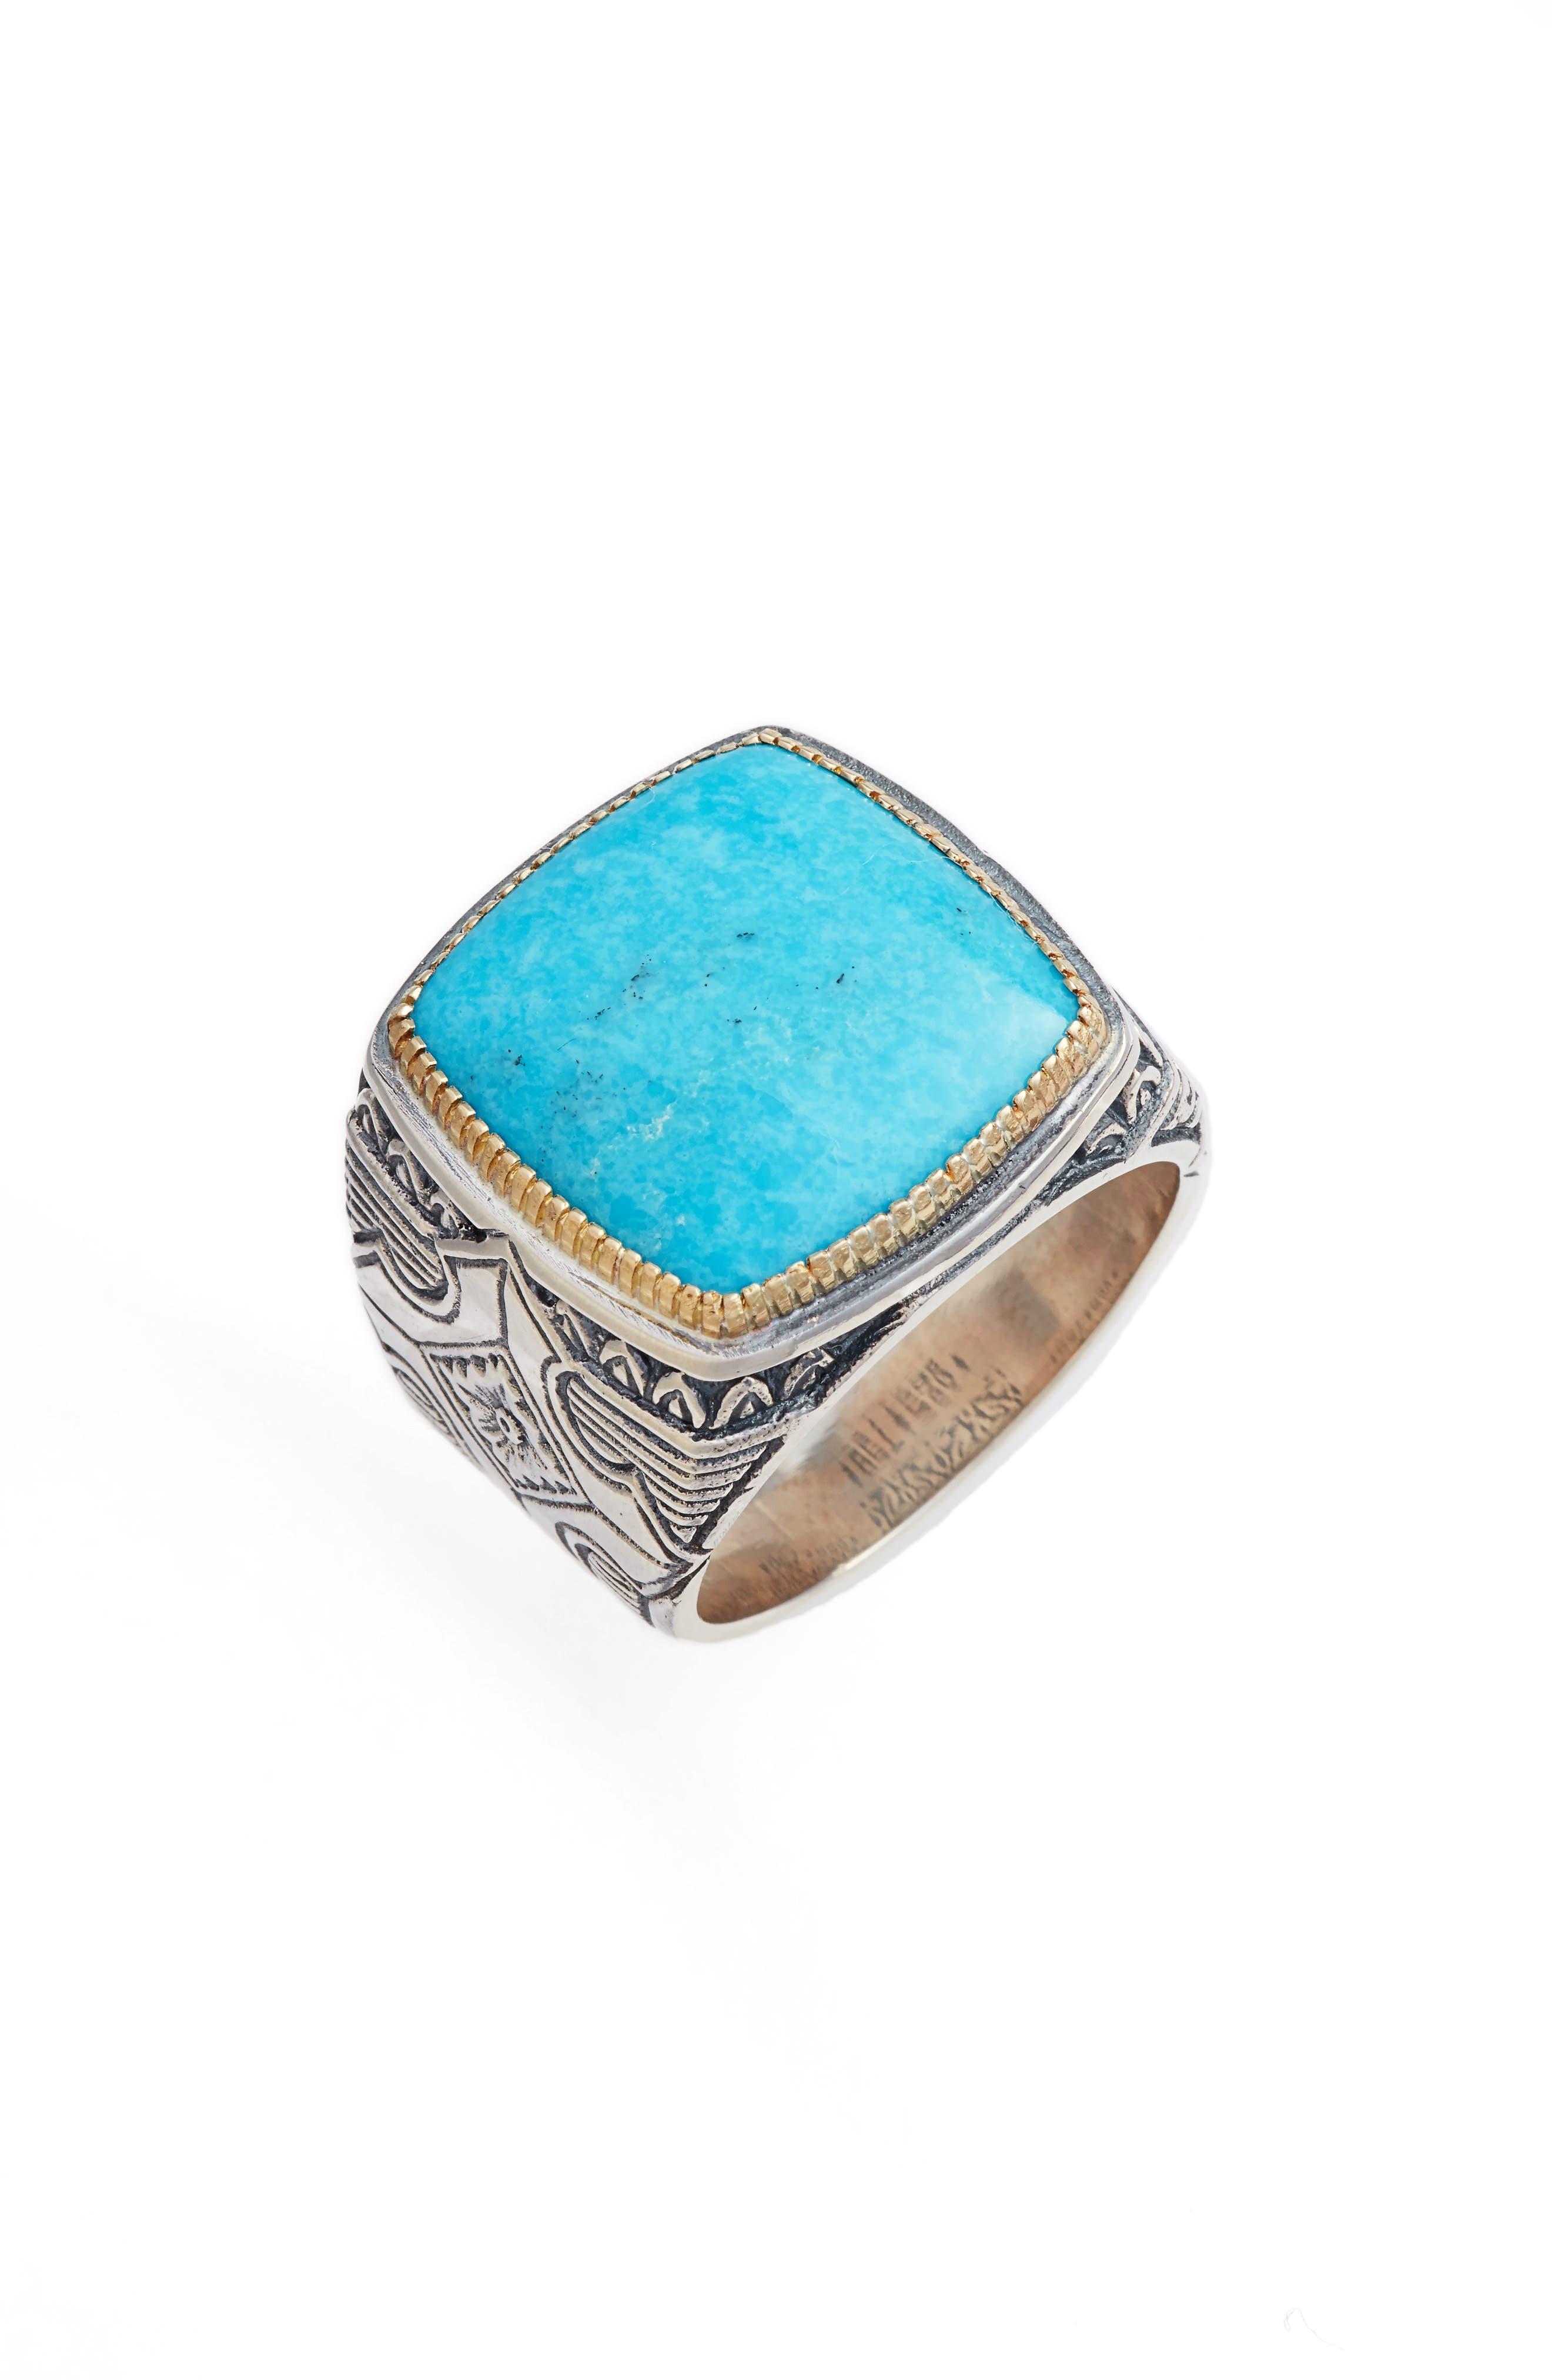 Main Image - Konstantino Heonos Square Turquoise Ring